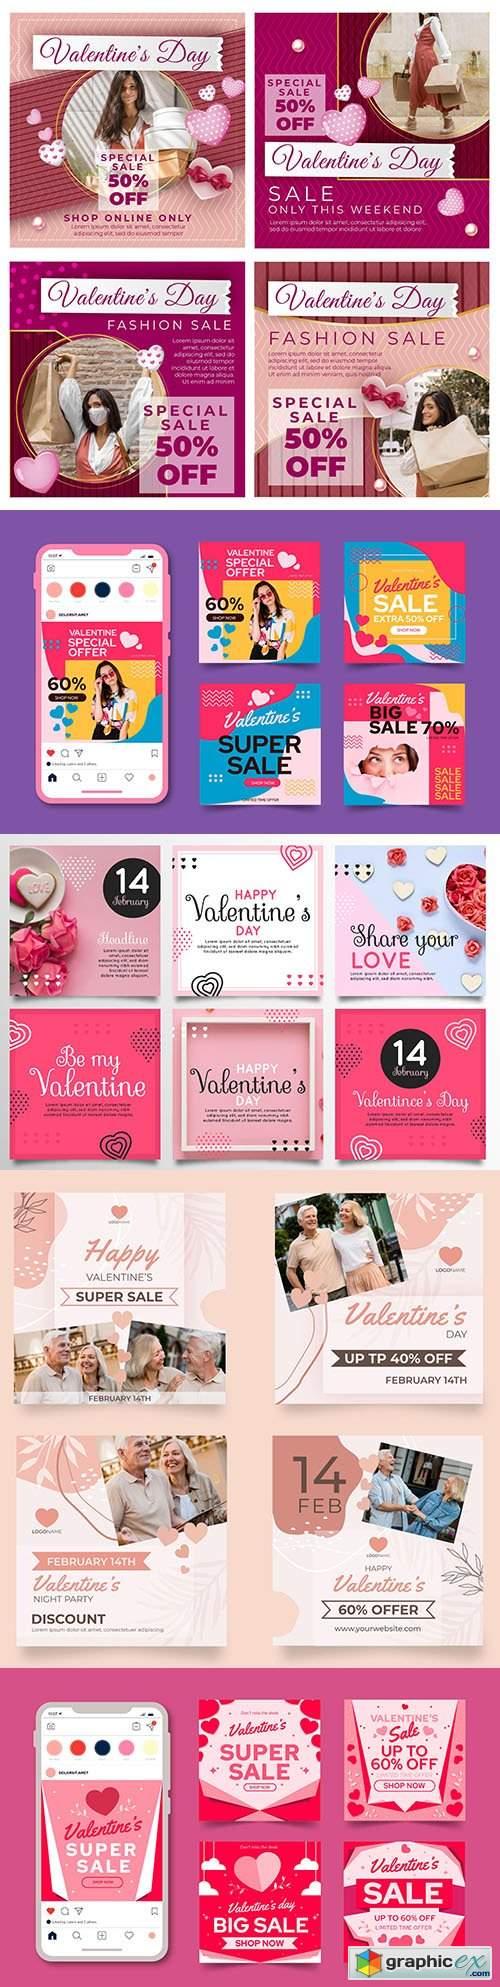 Valentine's Day collection posts on instagram design